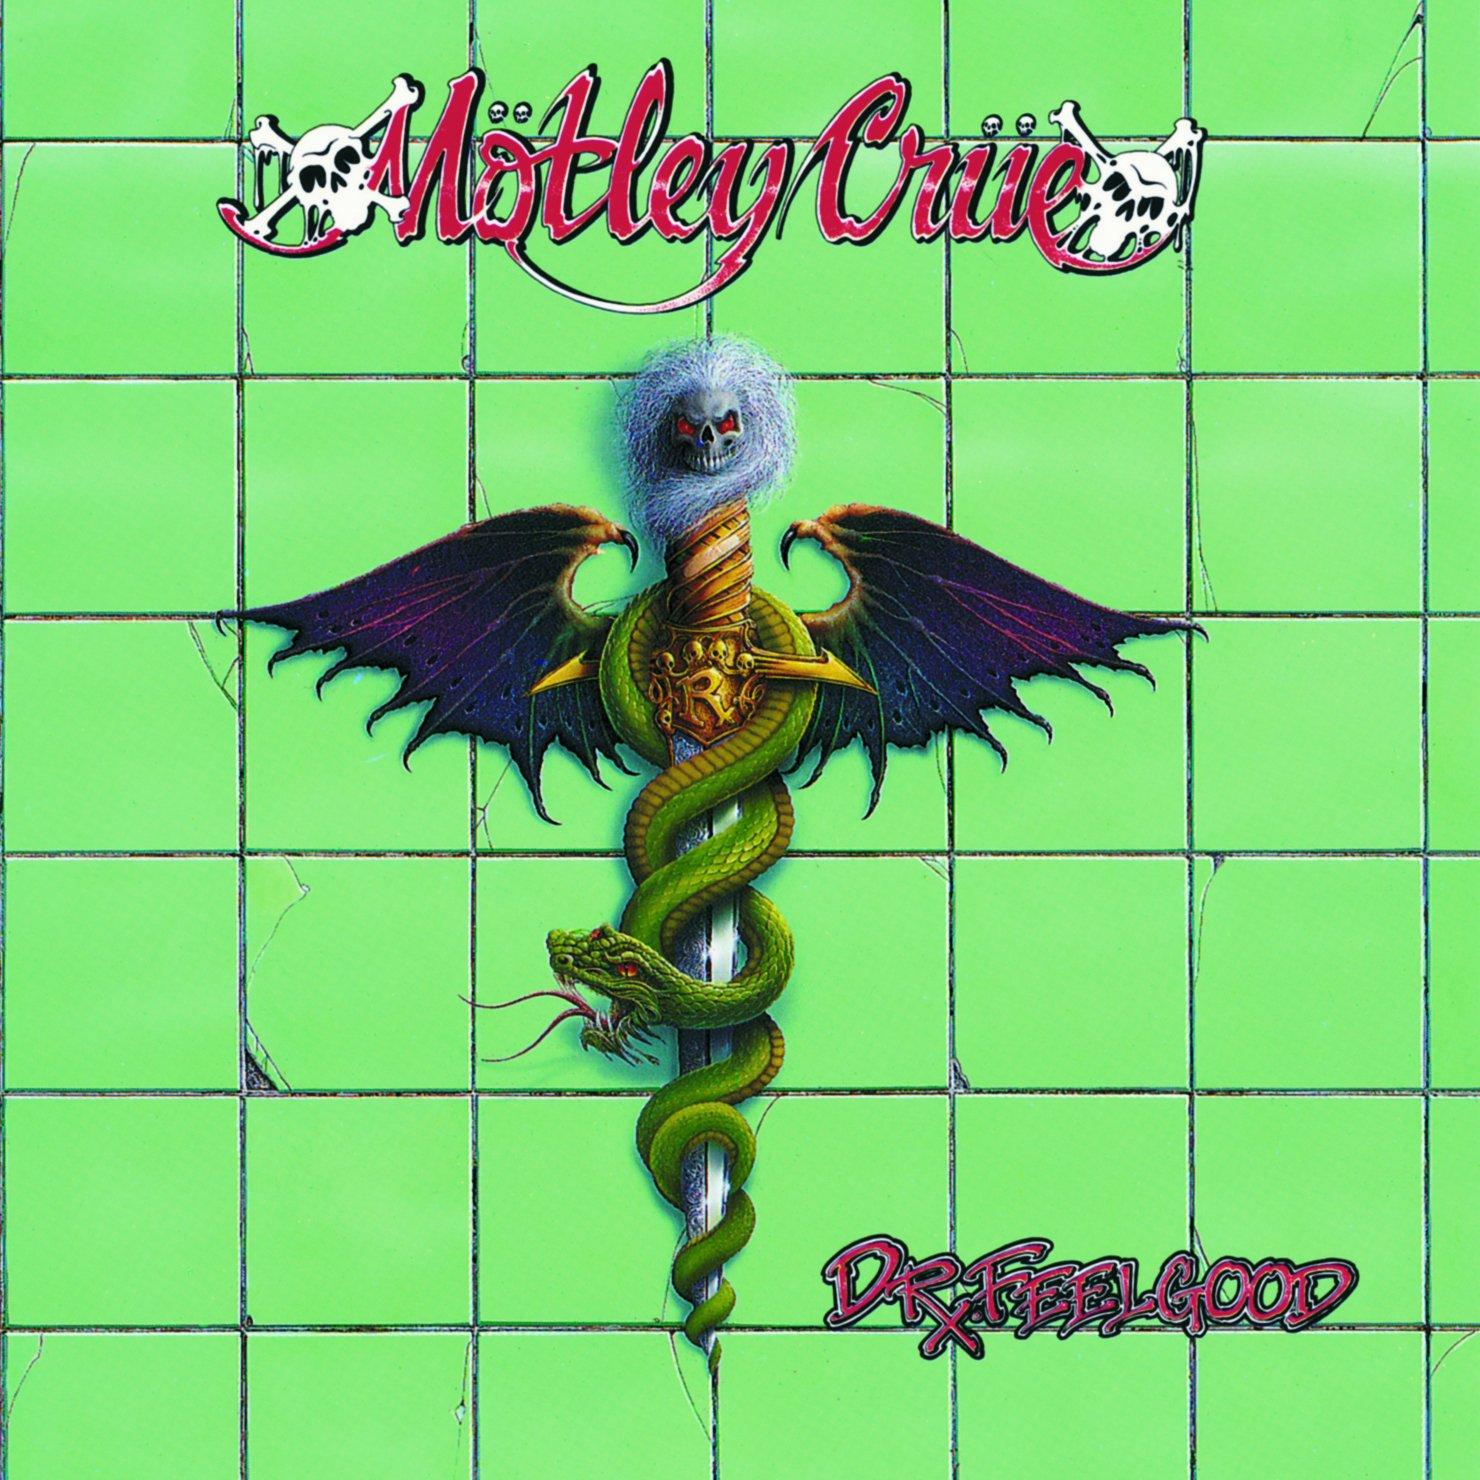 Mtley cre dr feelgood vinyl amazon music m4hsunfo